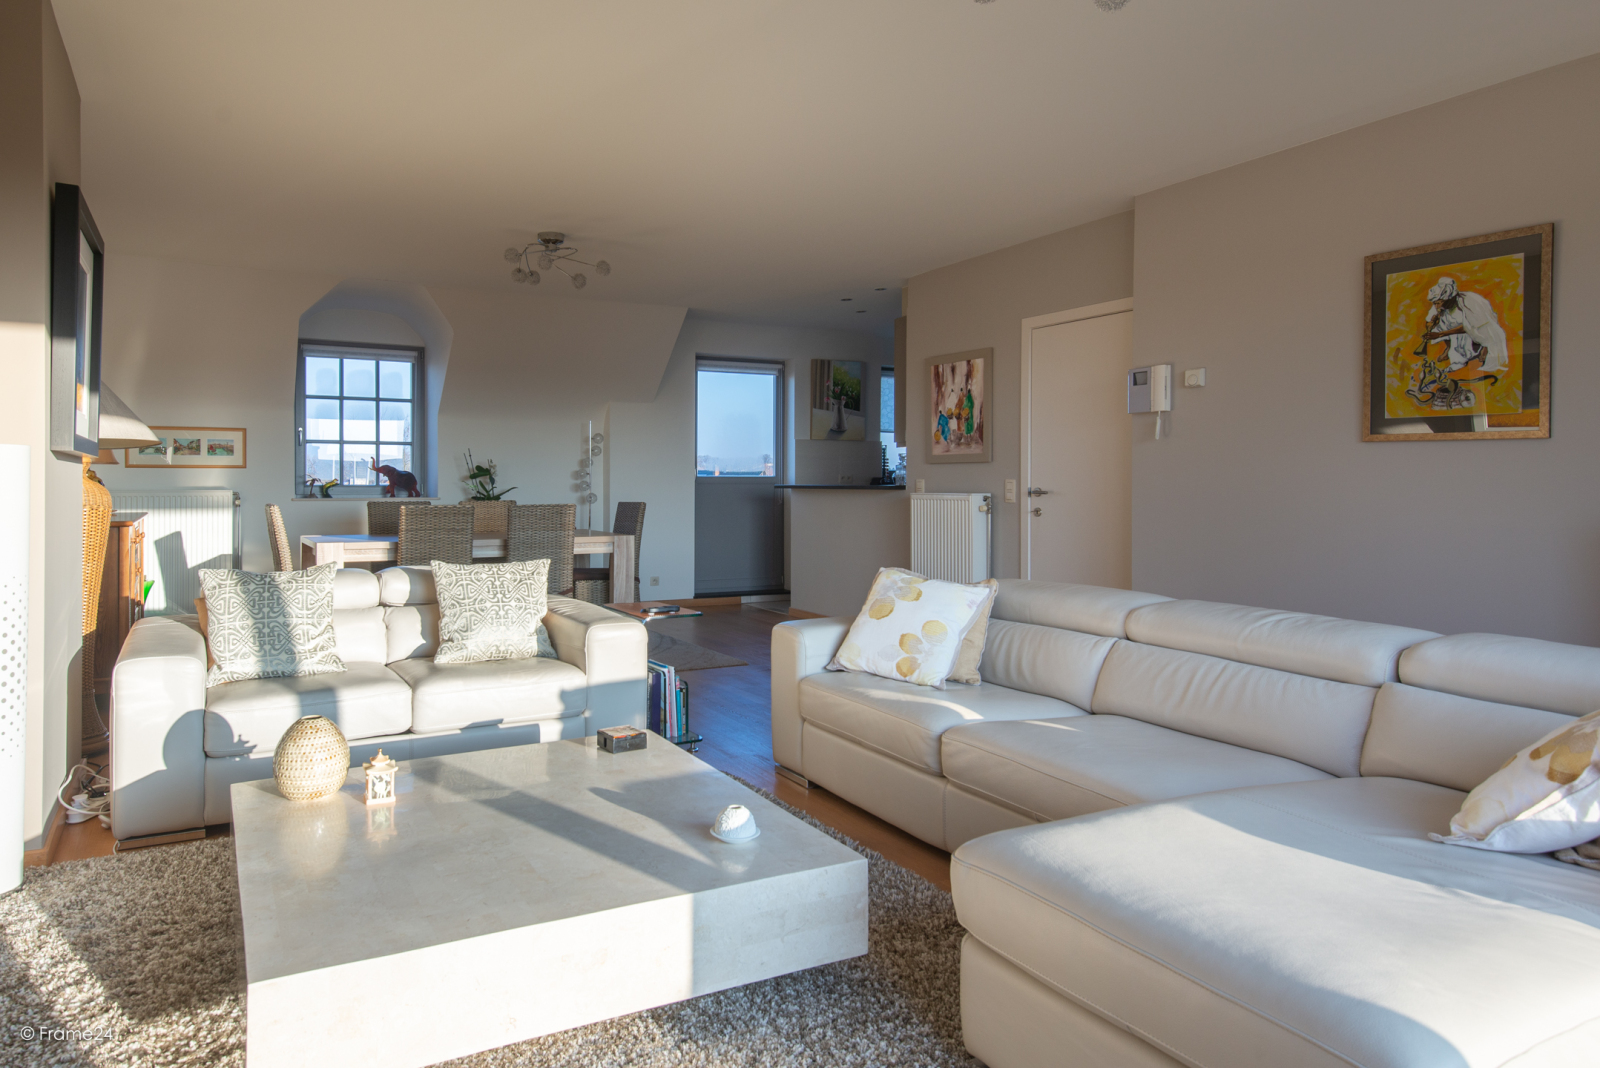 Riant dakappartement (130 m²) met zonnig terras in residentie 'Eyserhof' te Wijnegem! afbeelding 5